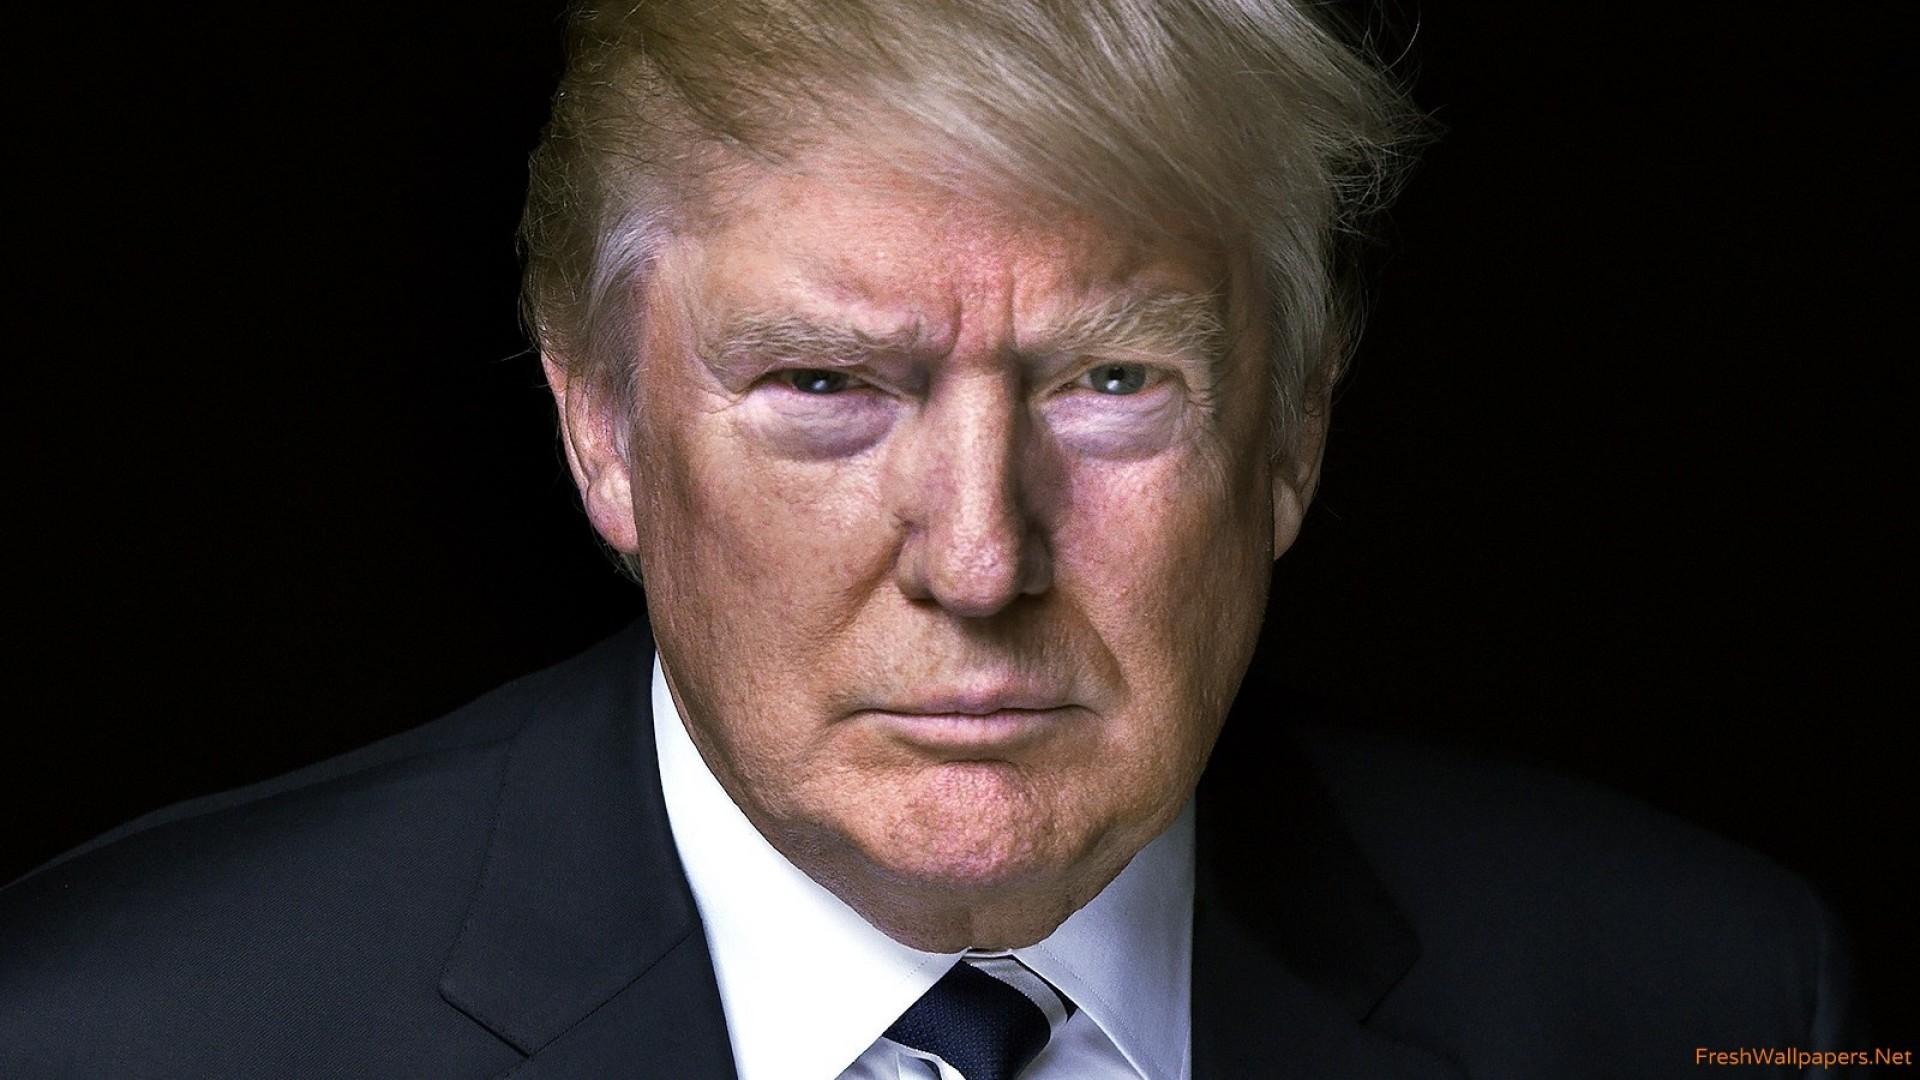 Why Did Trump Make The Travel Ban